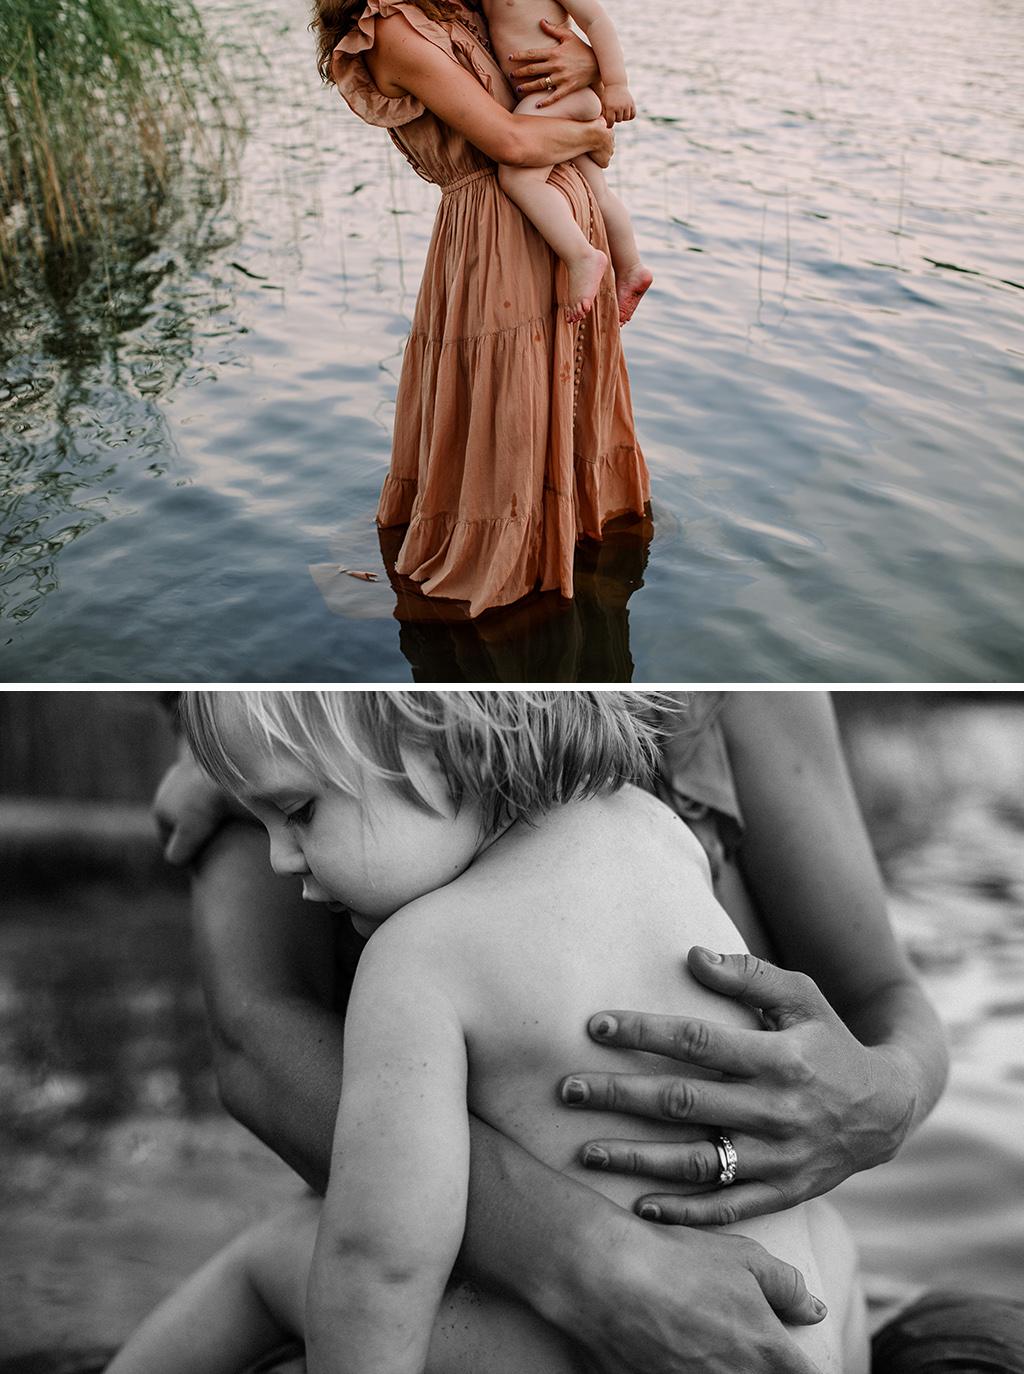 Hav-land_Fine-Art_Familjefotografering-i-vattnet_Stockholm-4.jpg